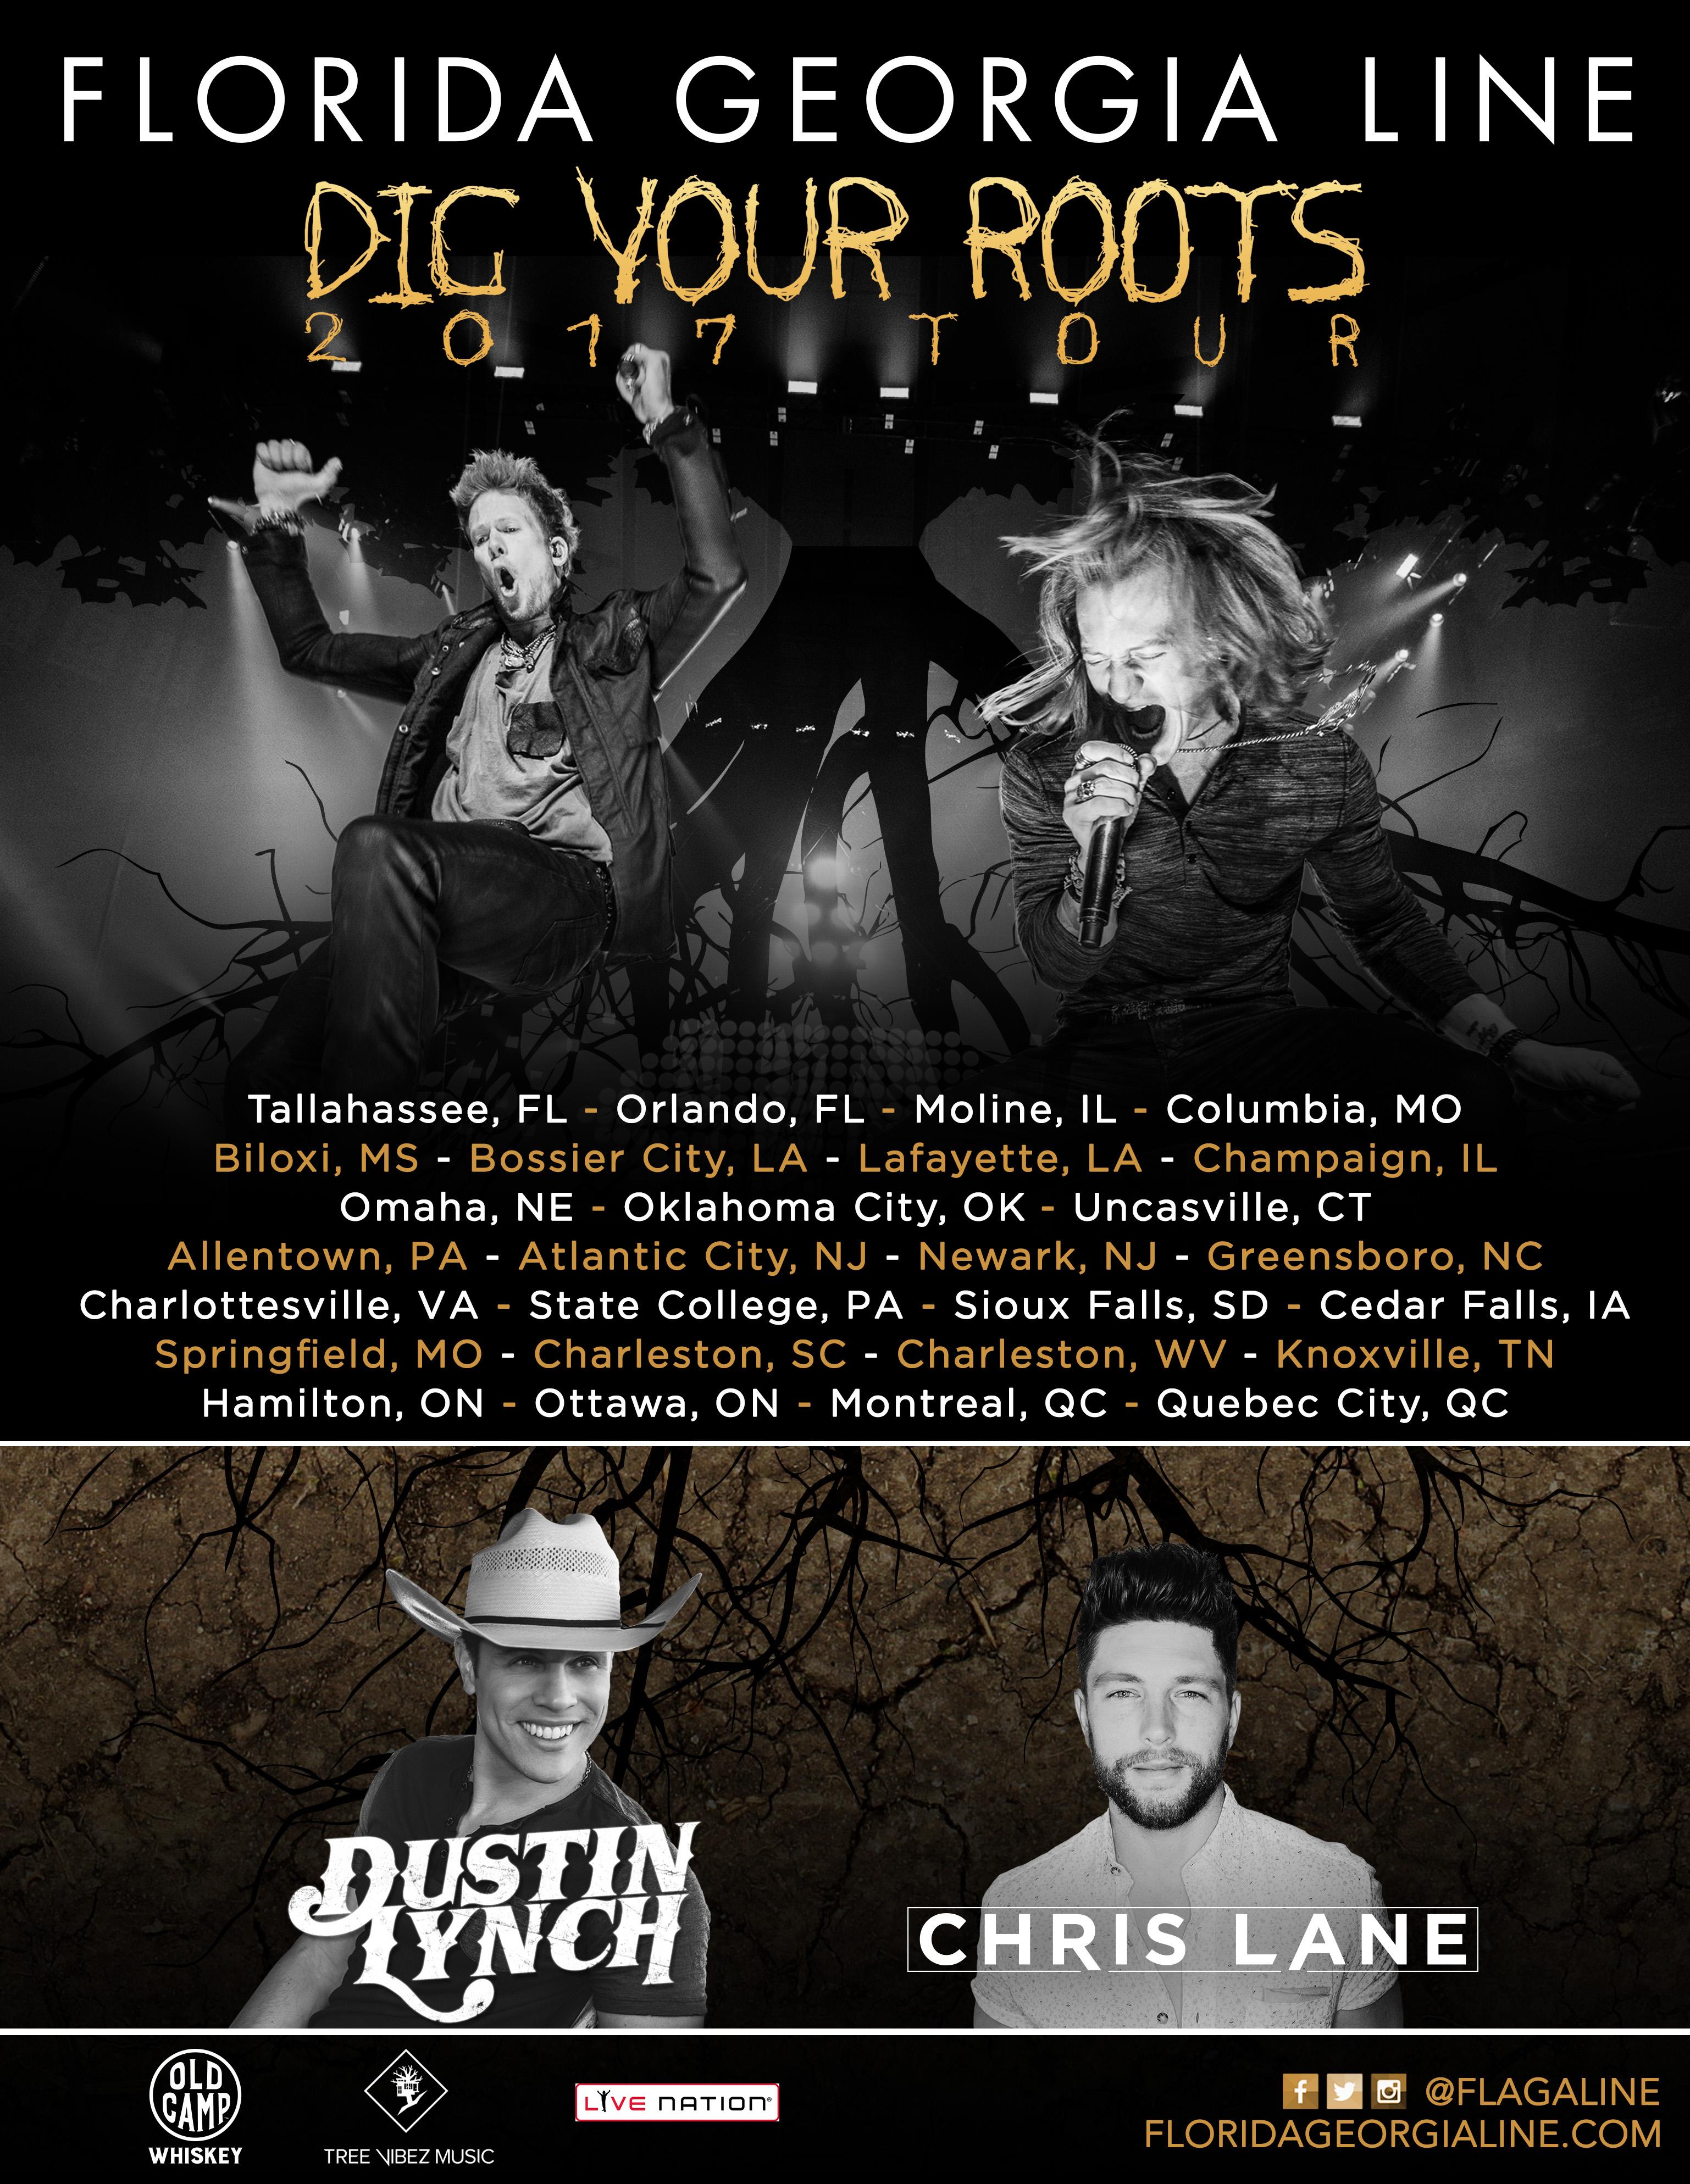 Florida Georgia Line Dig Your Roots Tour April